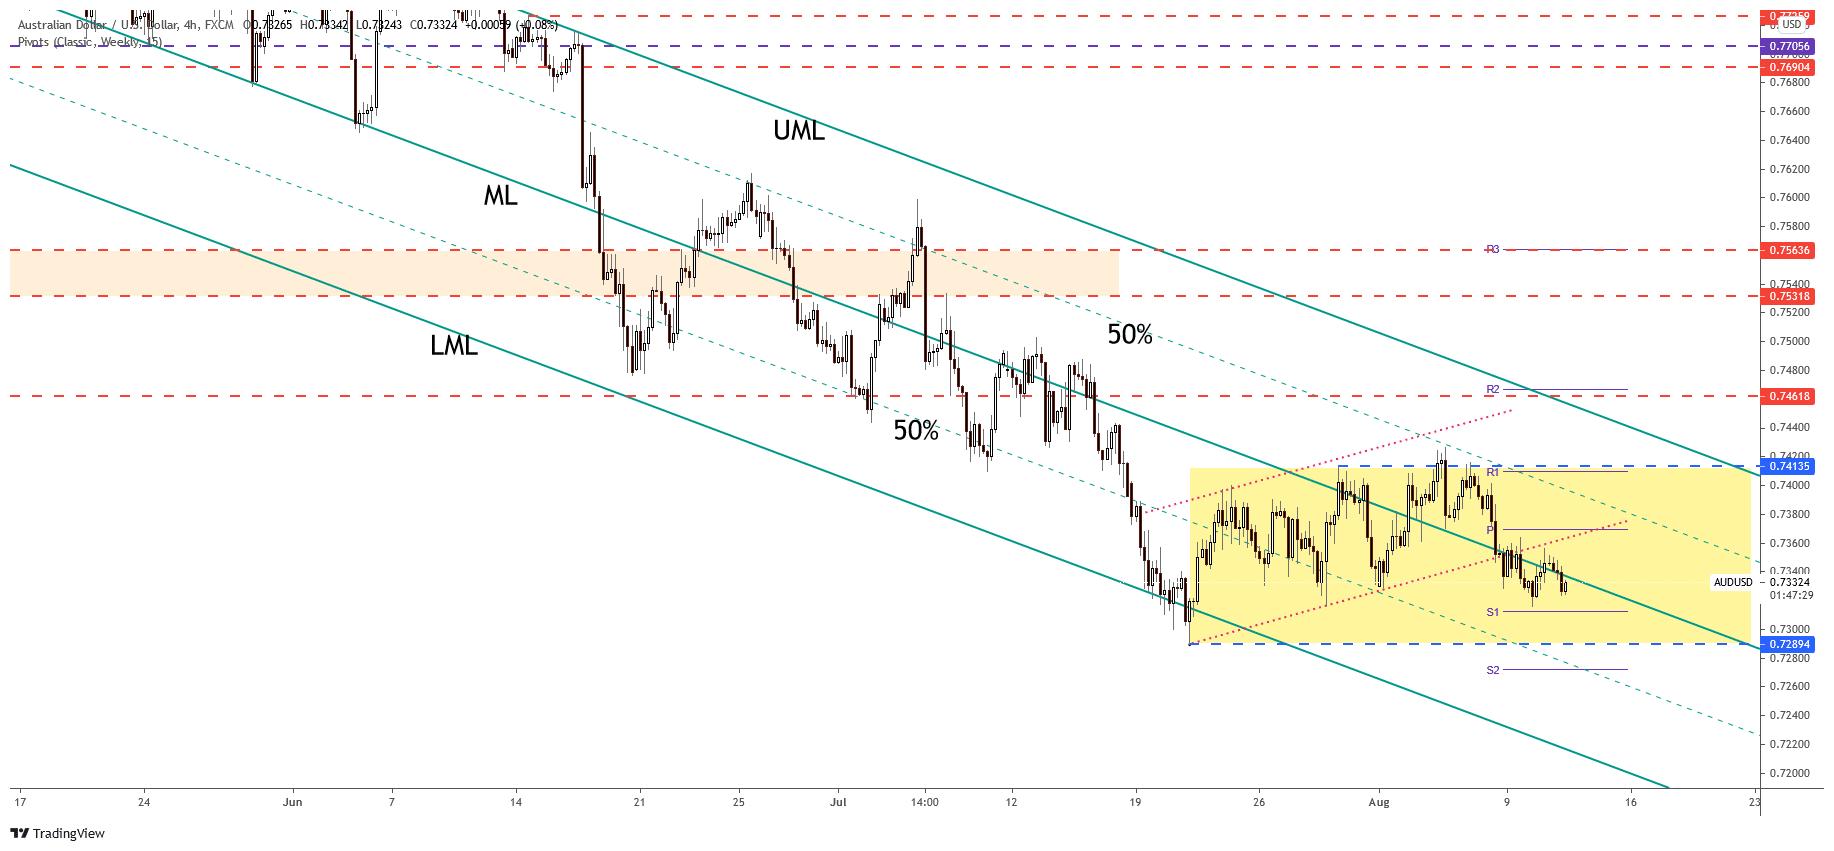 AUD/USD 4-hour price chart